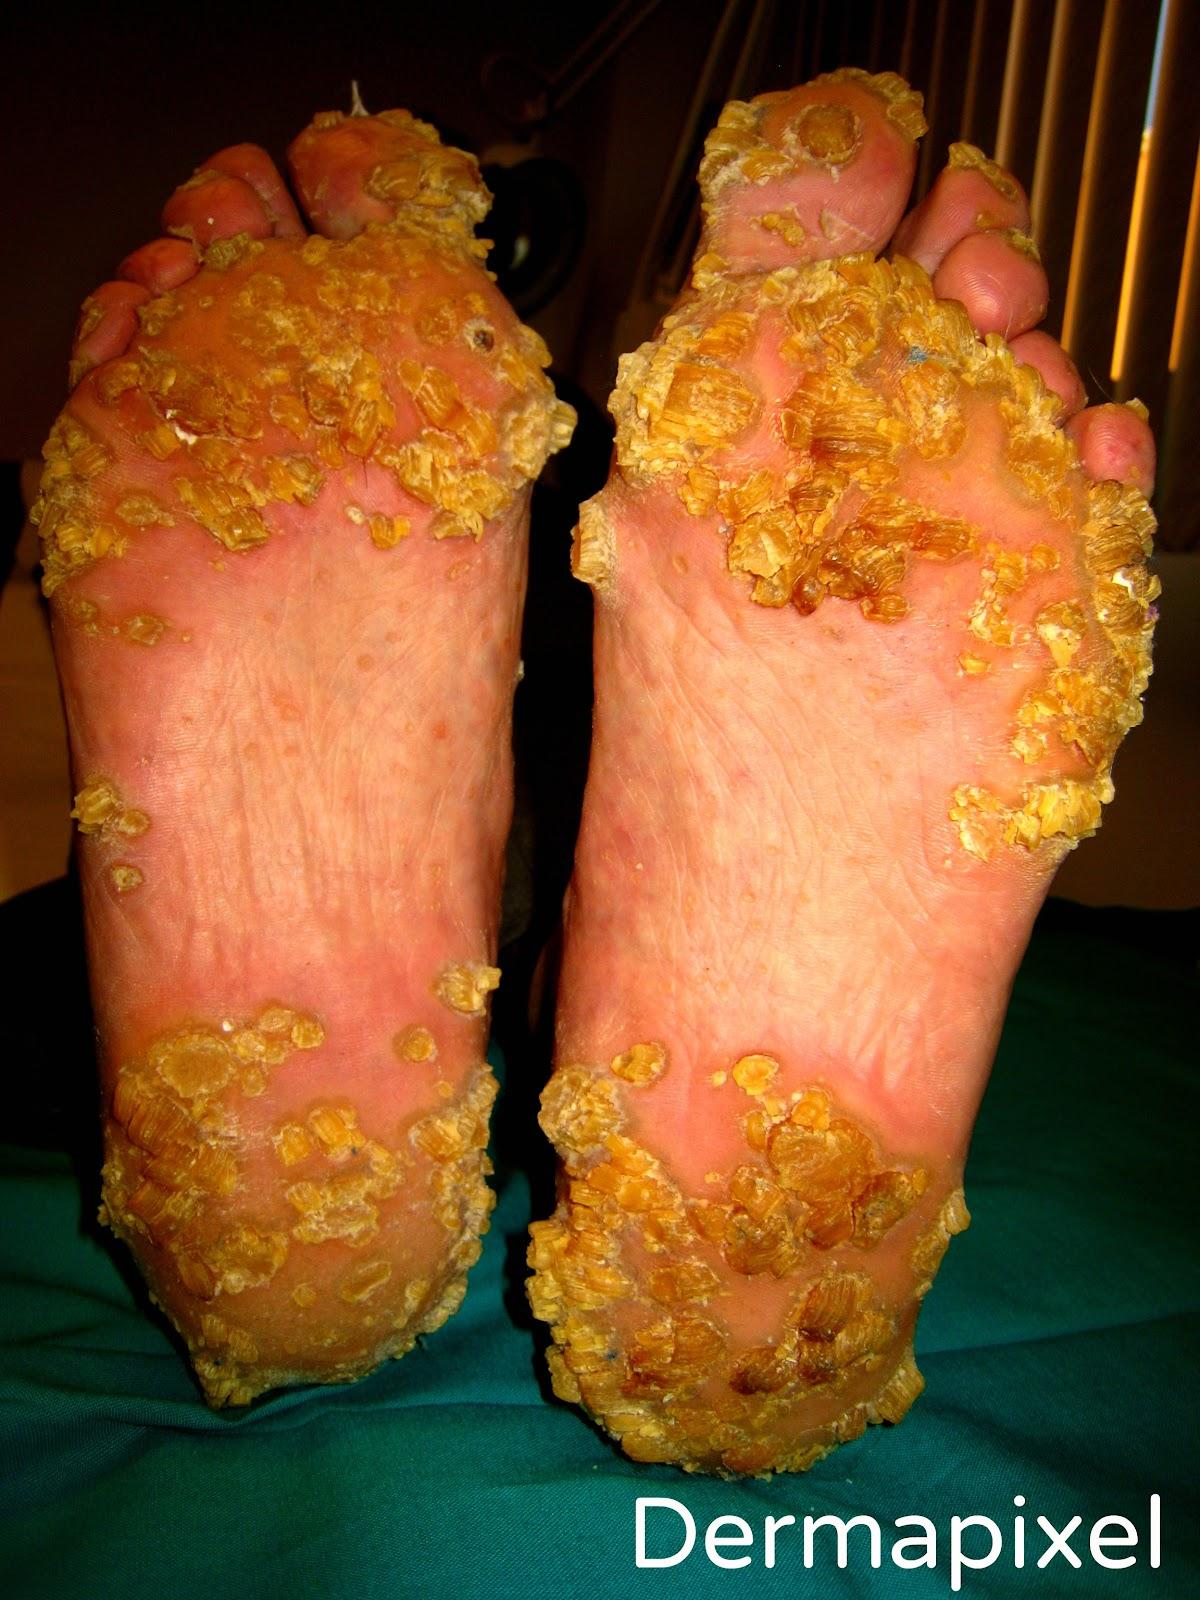 Cum on feet who is she please id - 2 1